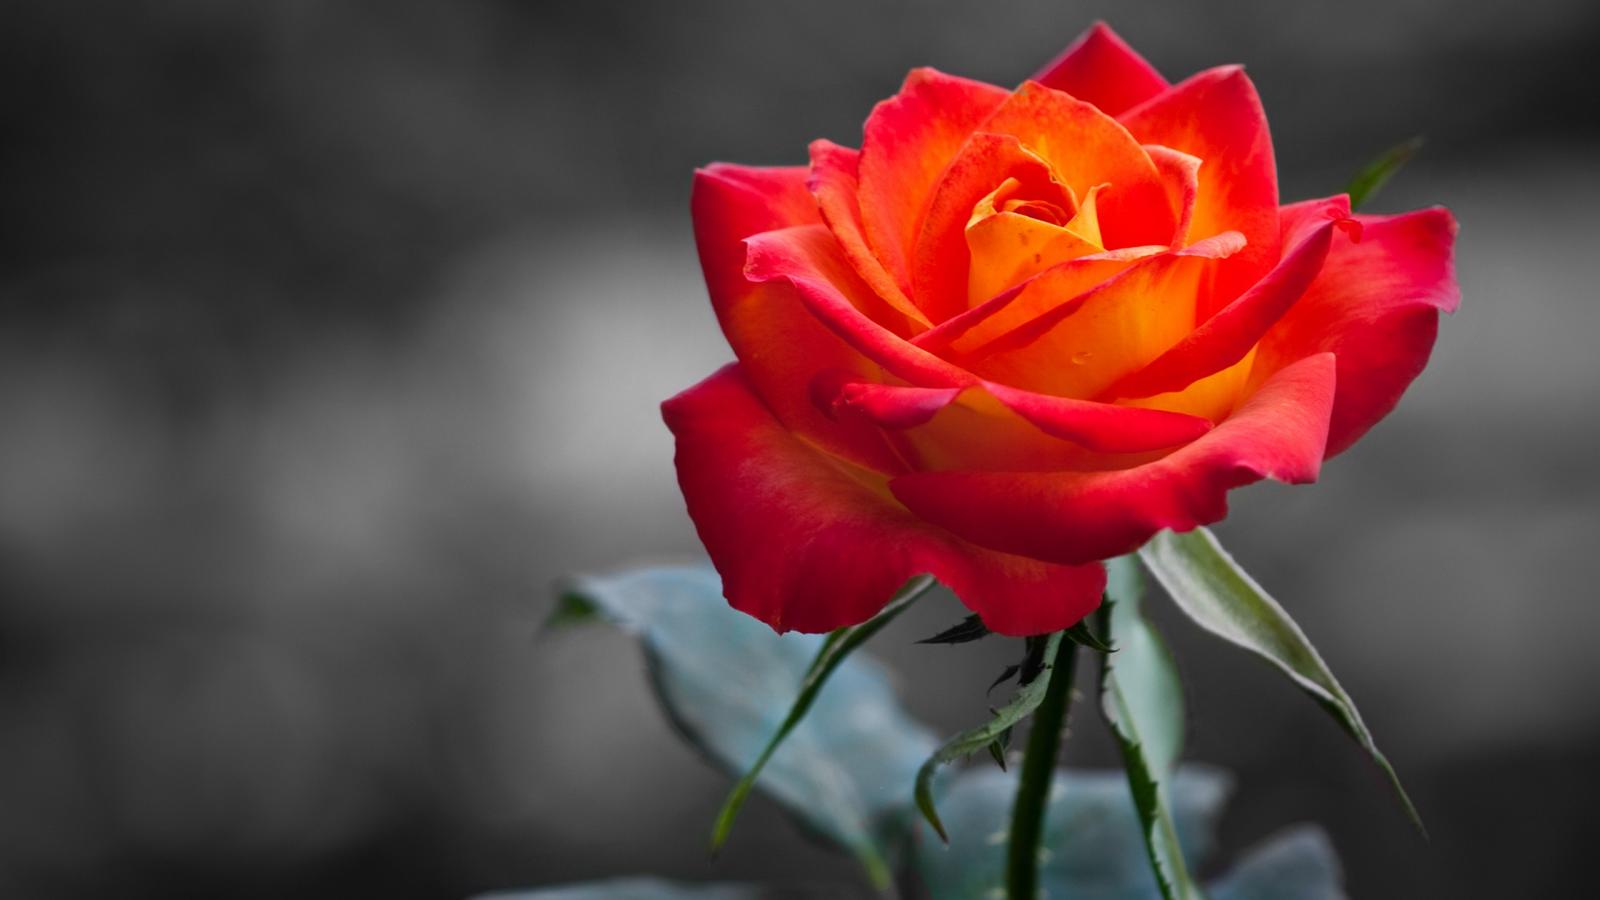 Rose by dragonitearmy